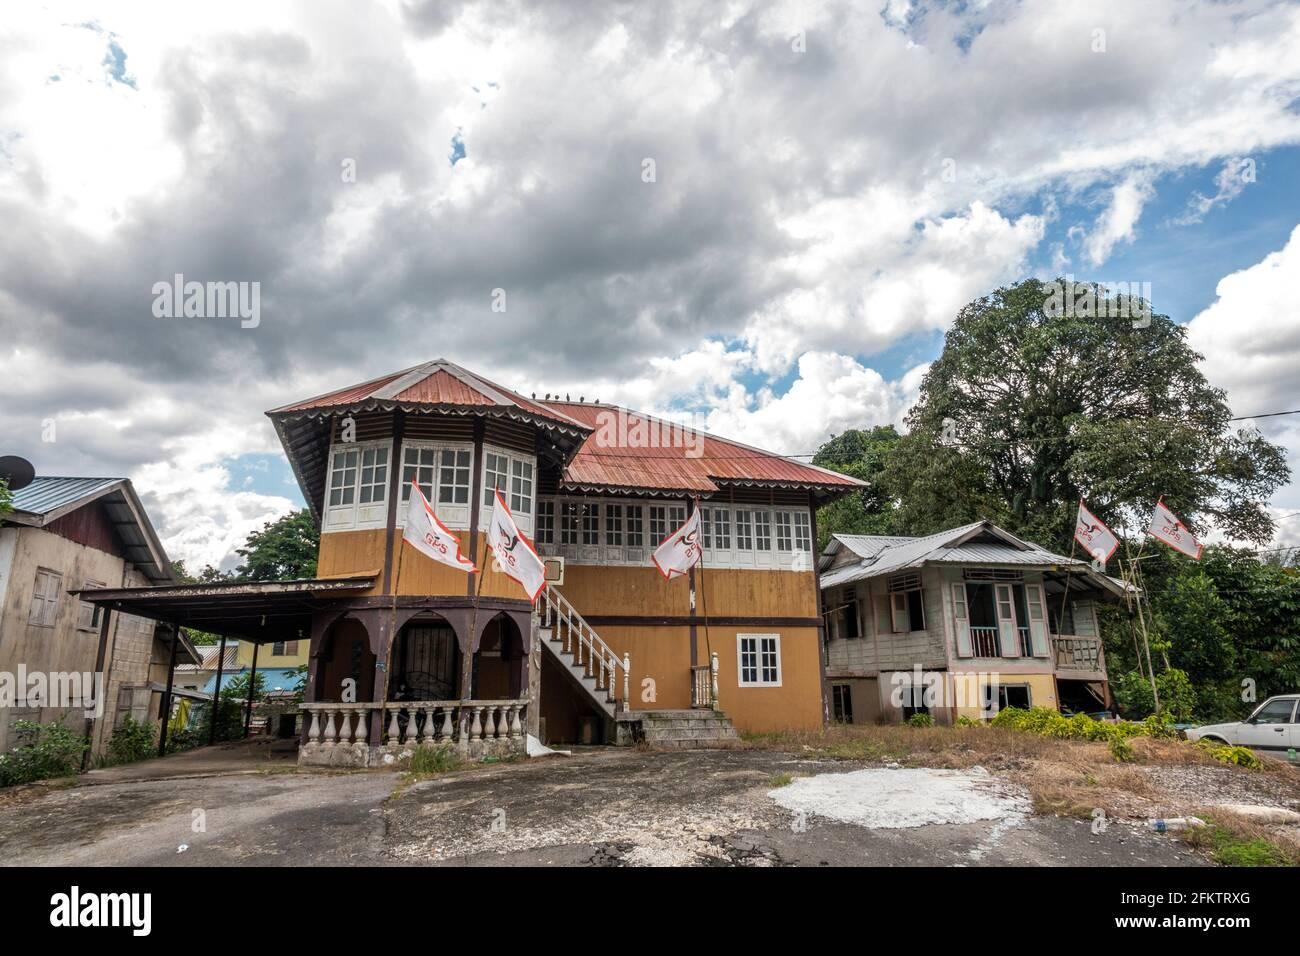 Antigua casa de bungalows de madera en Buso, Bau, Sarawak, Malasia Oriental Foto de stock